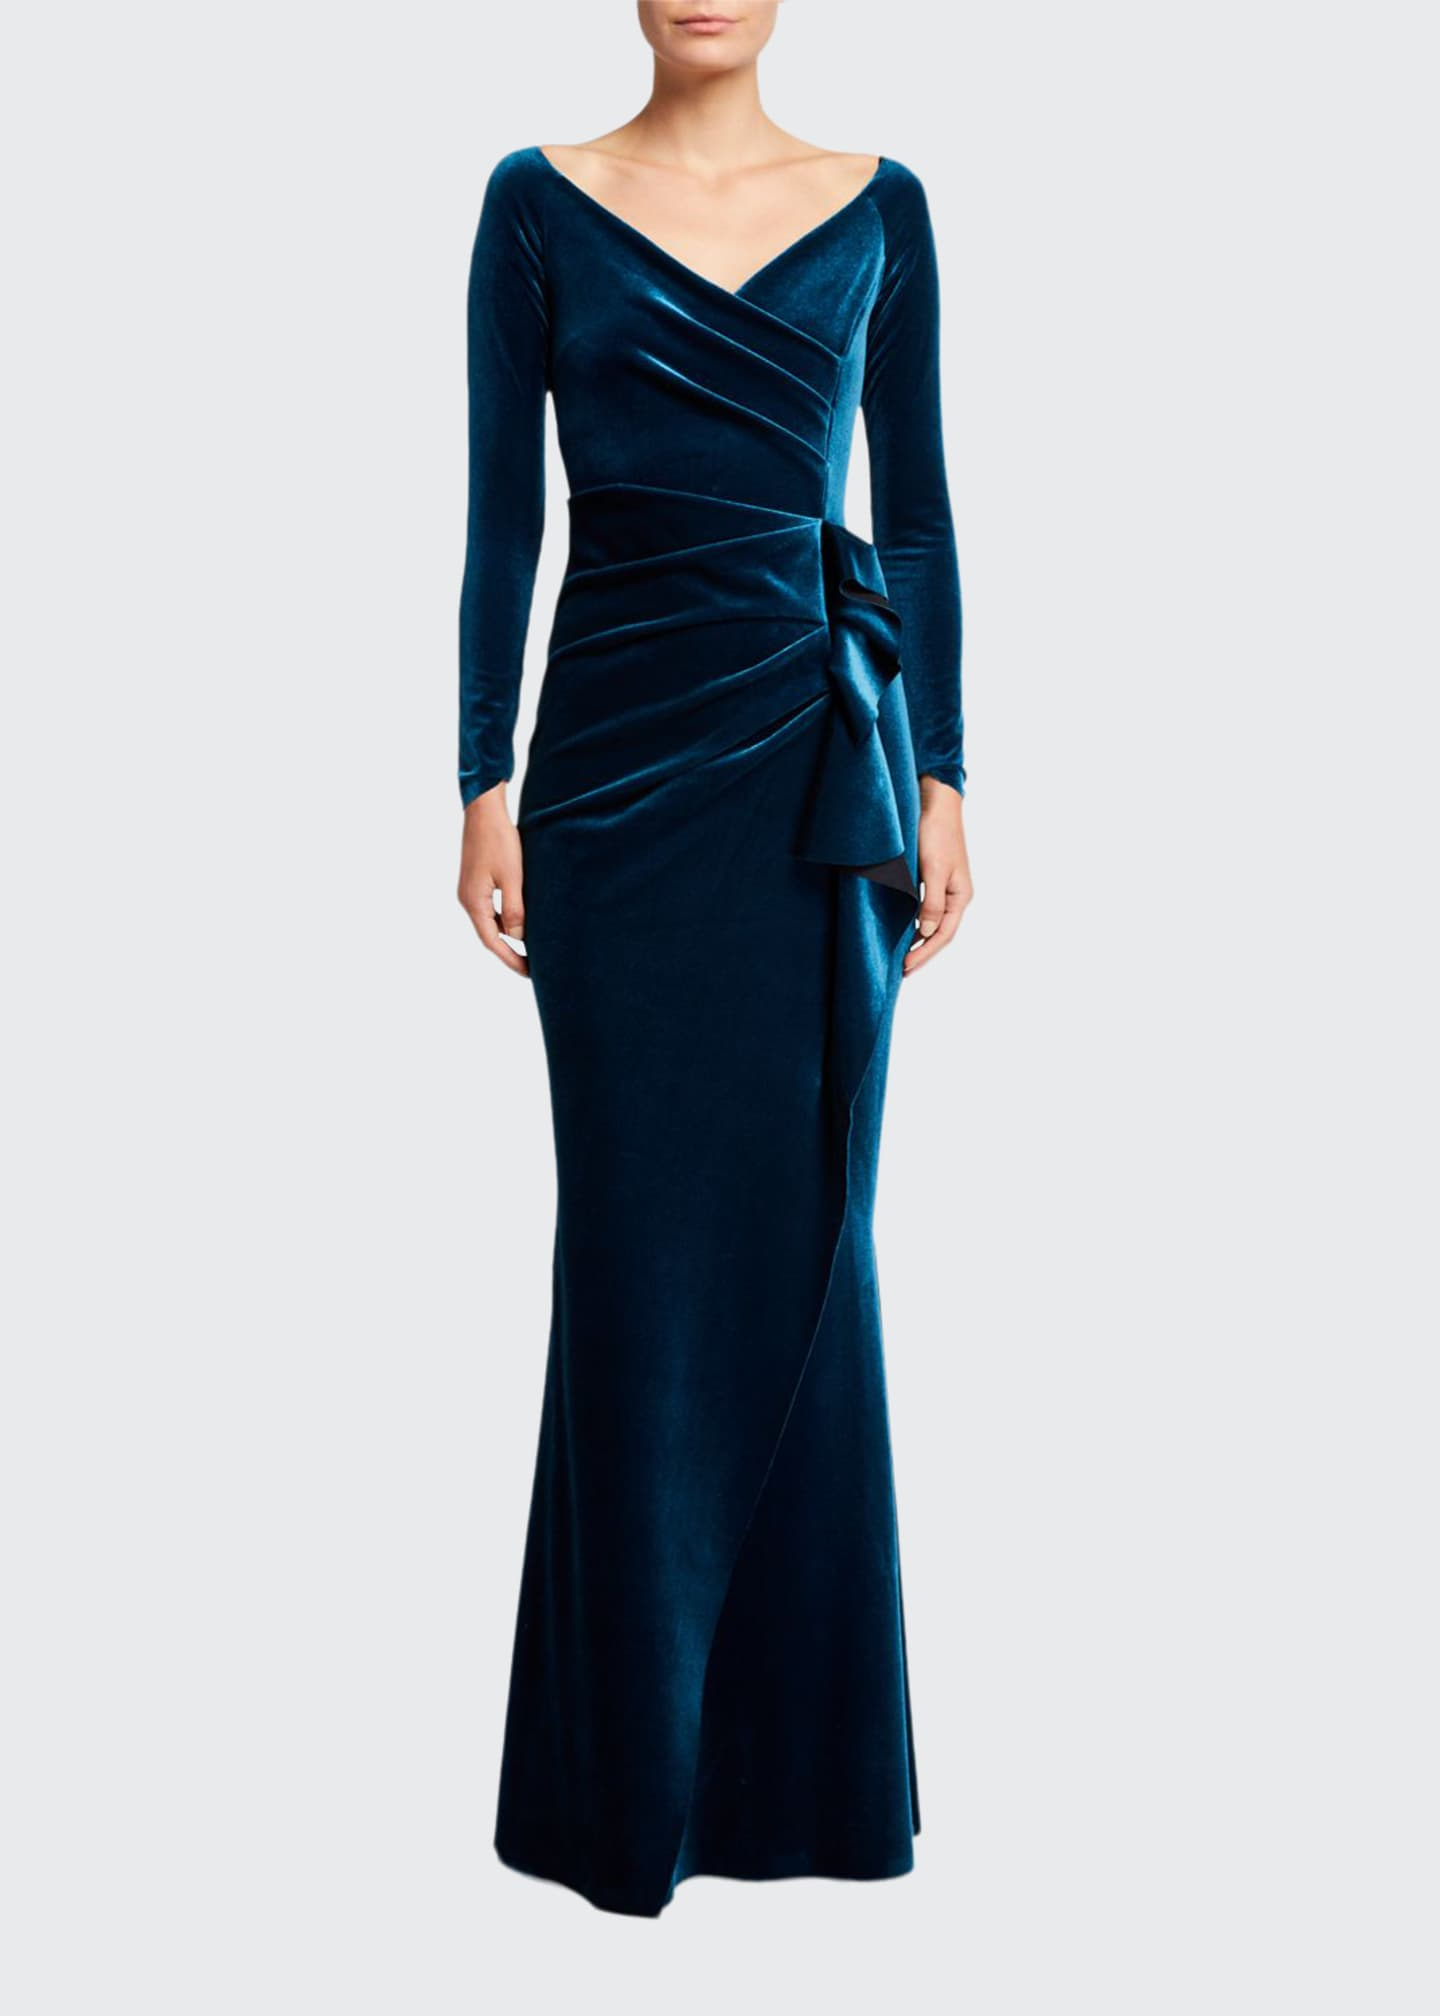 Chiara Boni La Petite Robe V-Neck Long-Sleeve Side